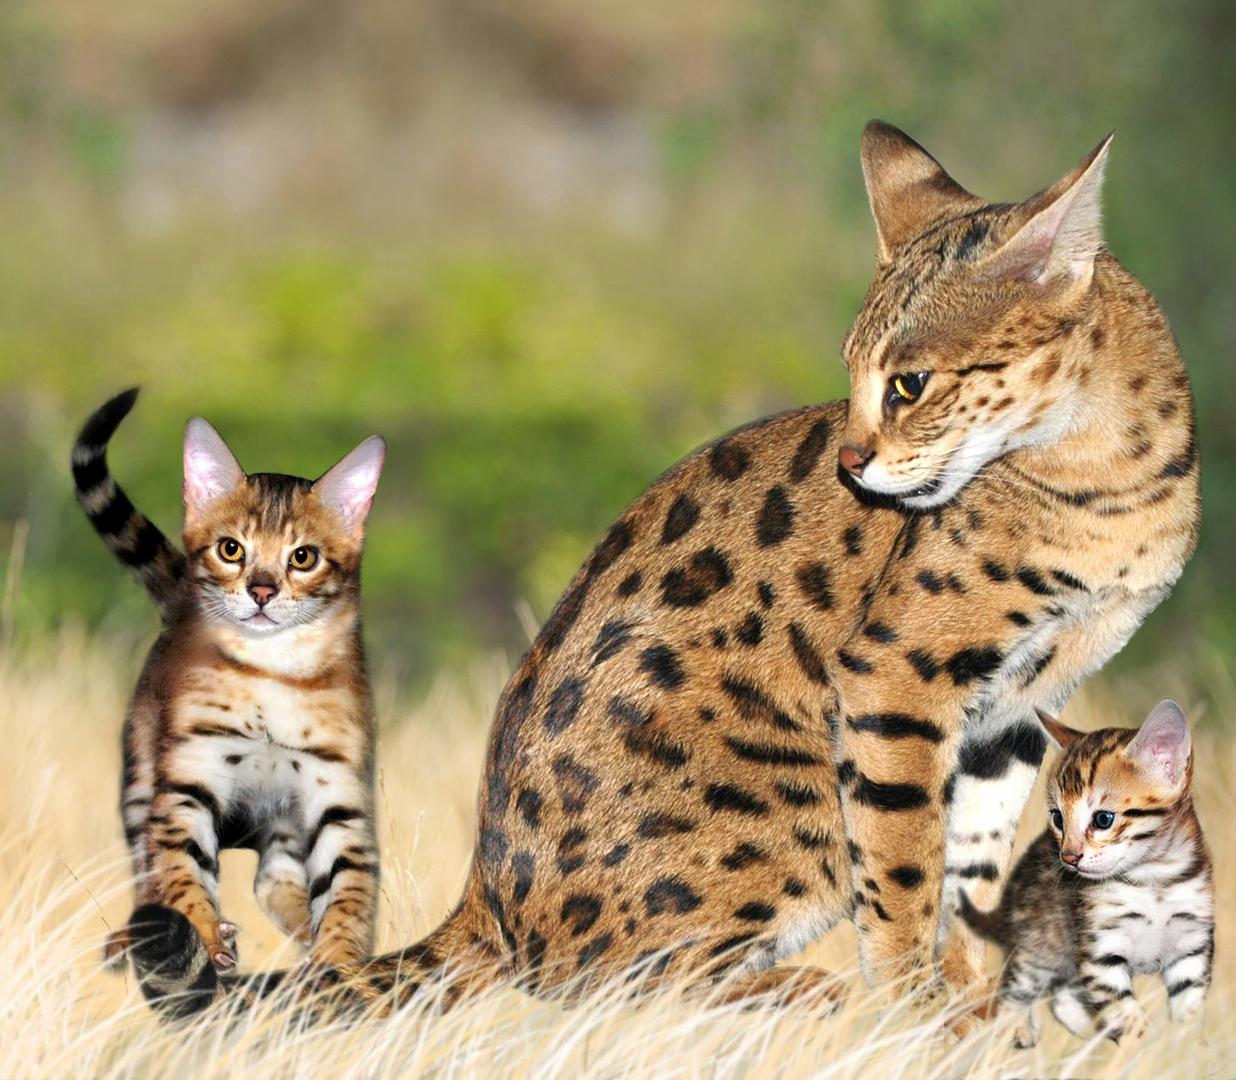 Kessavannah - Animal Care, Animal Transportation